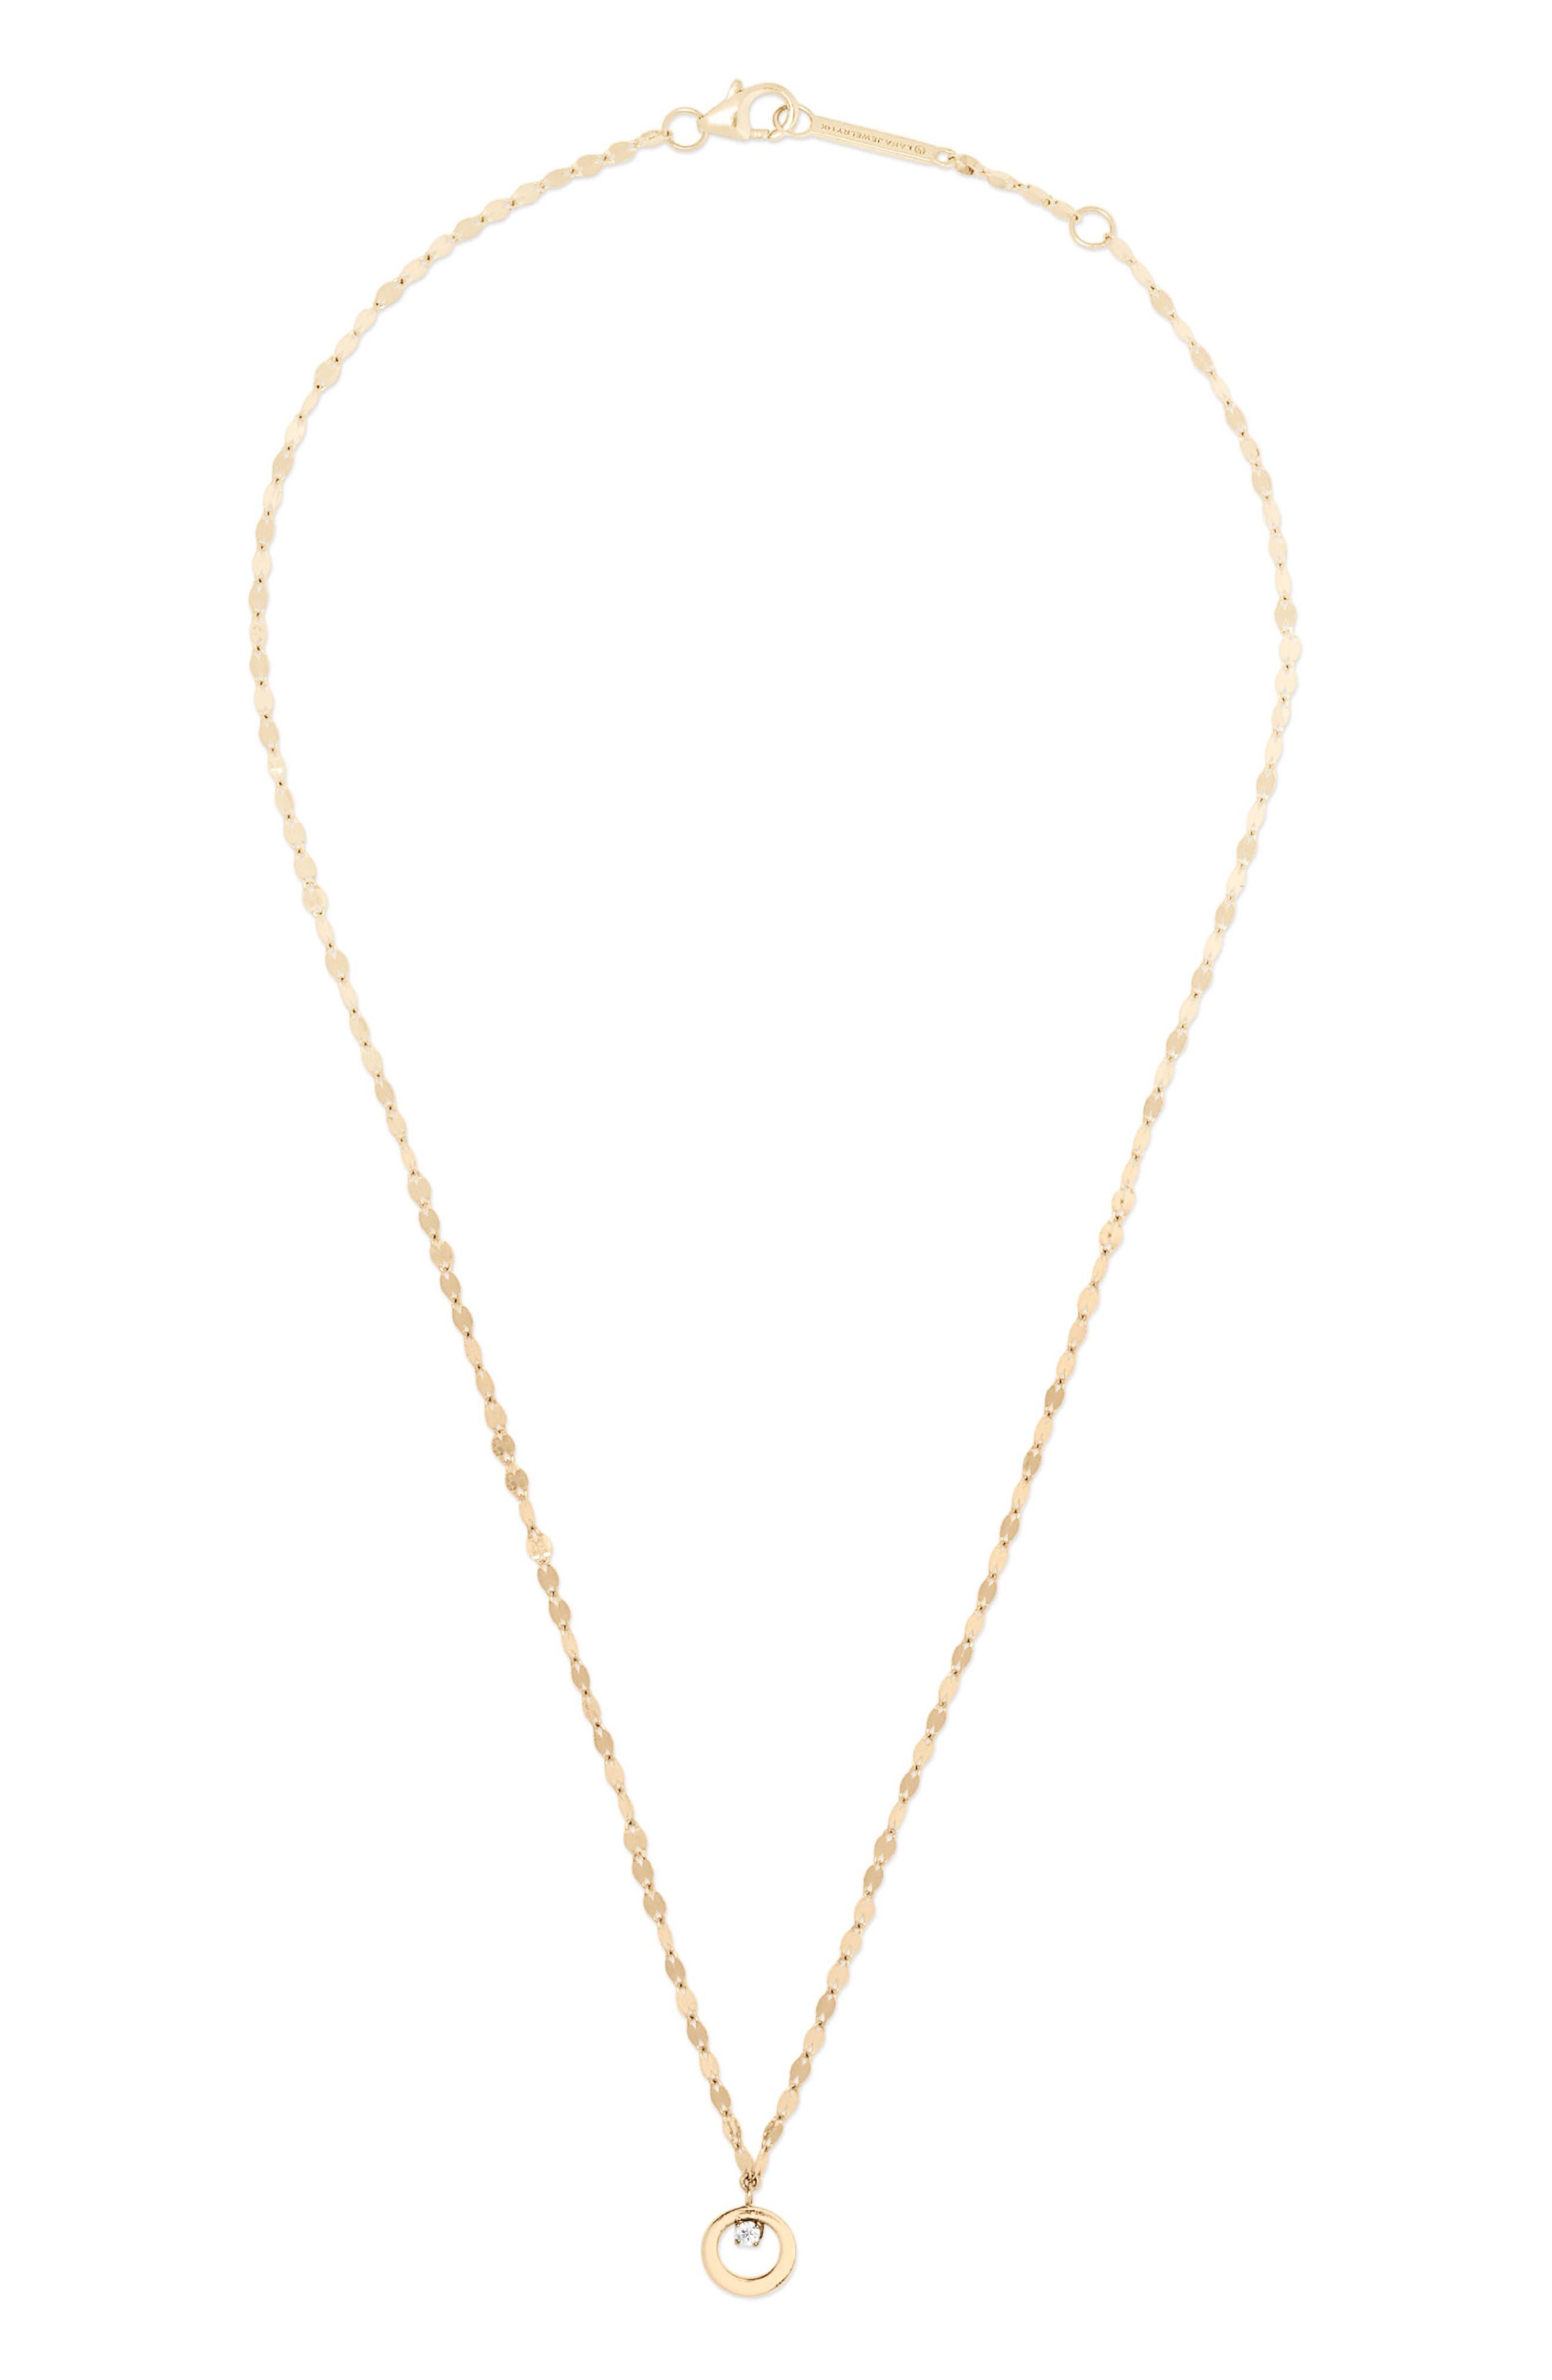 Solo Mini Bond Cusp Pendant Necklace